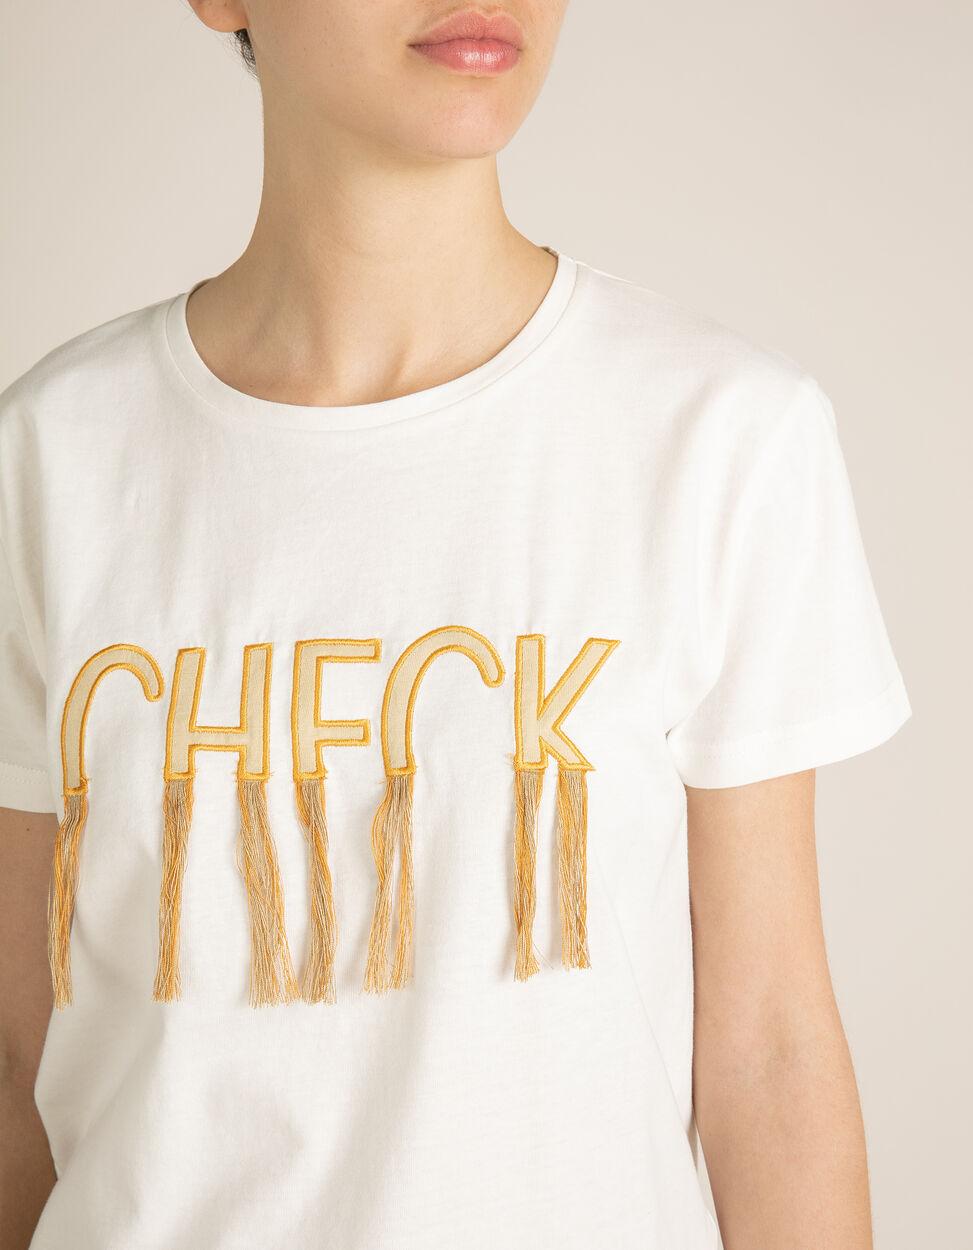 T-Shirt Check